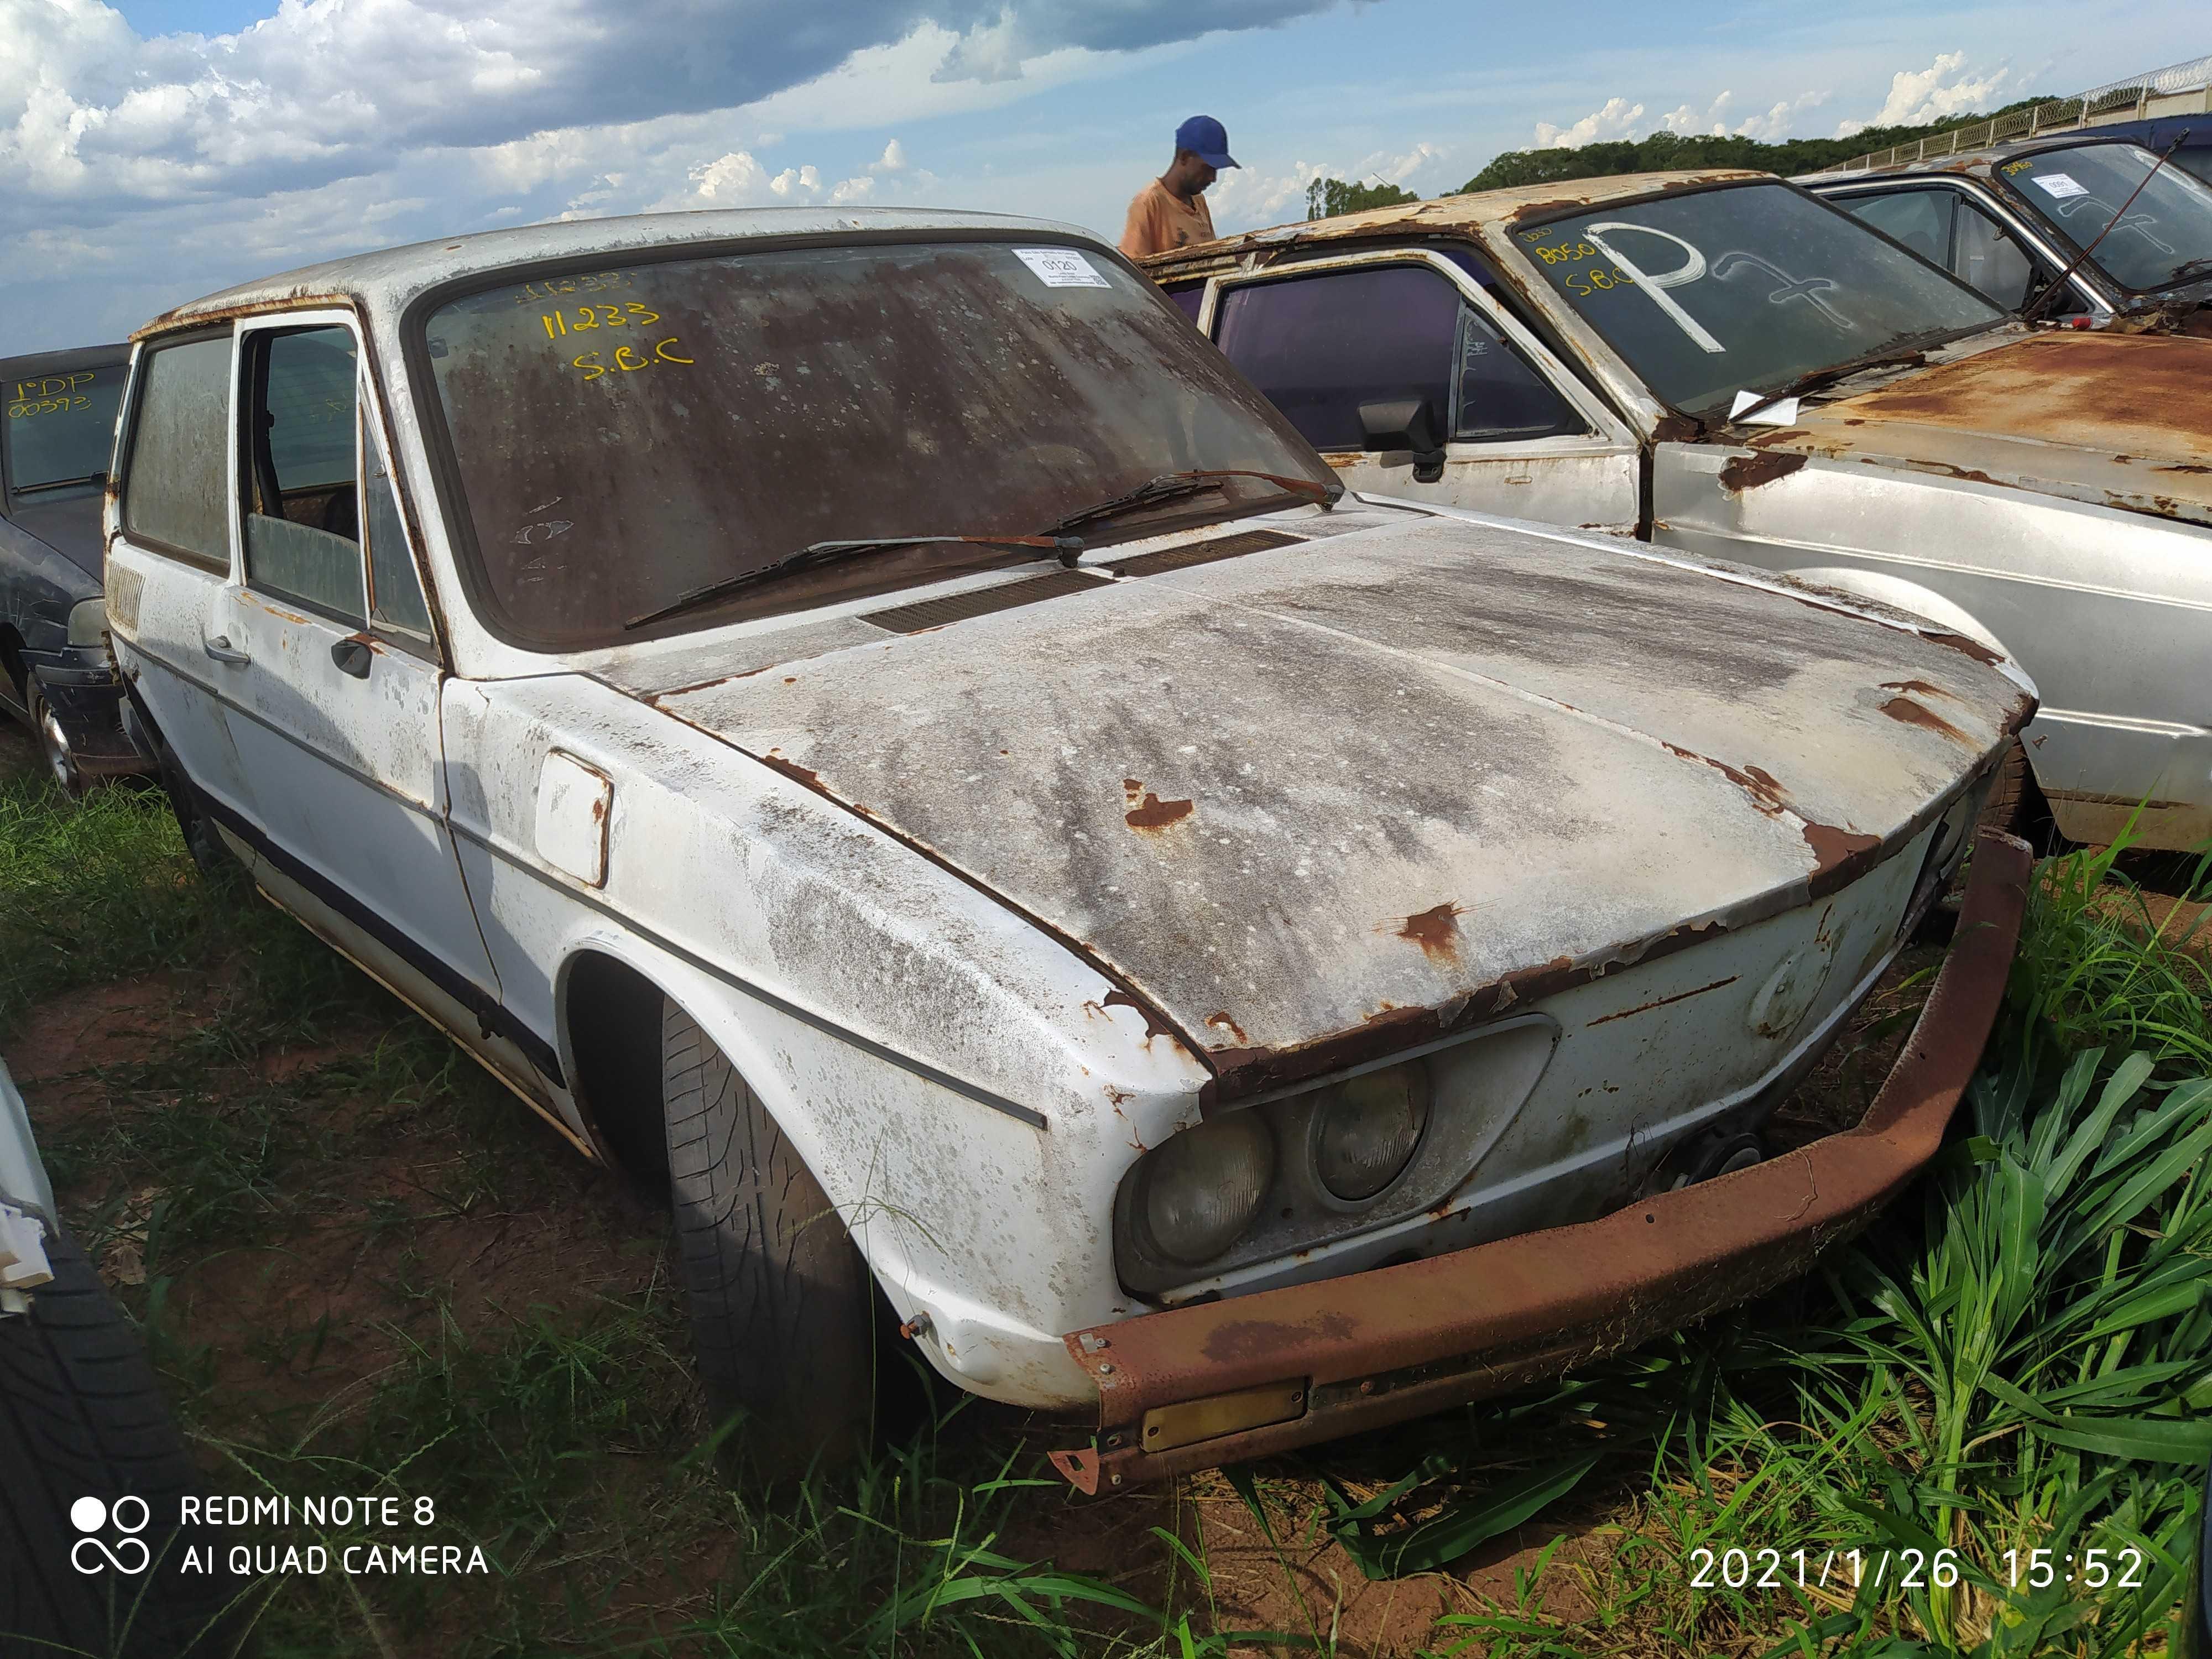 VW/BRASILIA - 1977/1977 - Sucata Aproveitavel